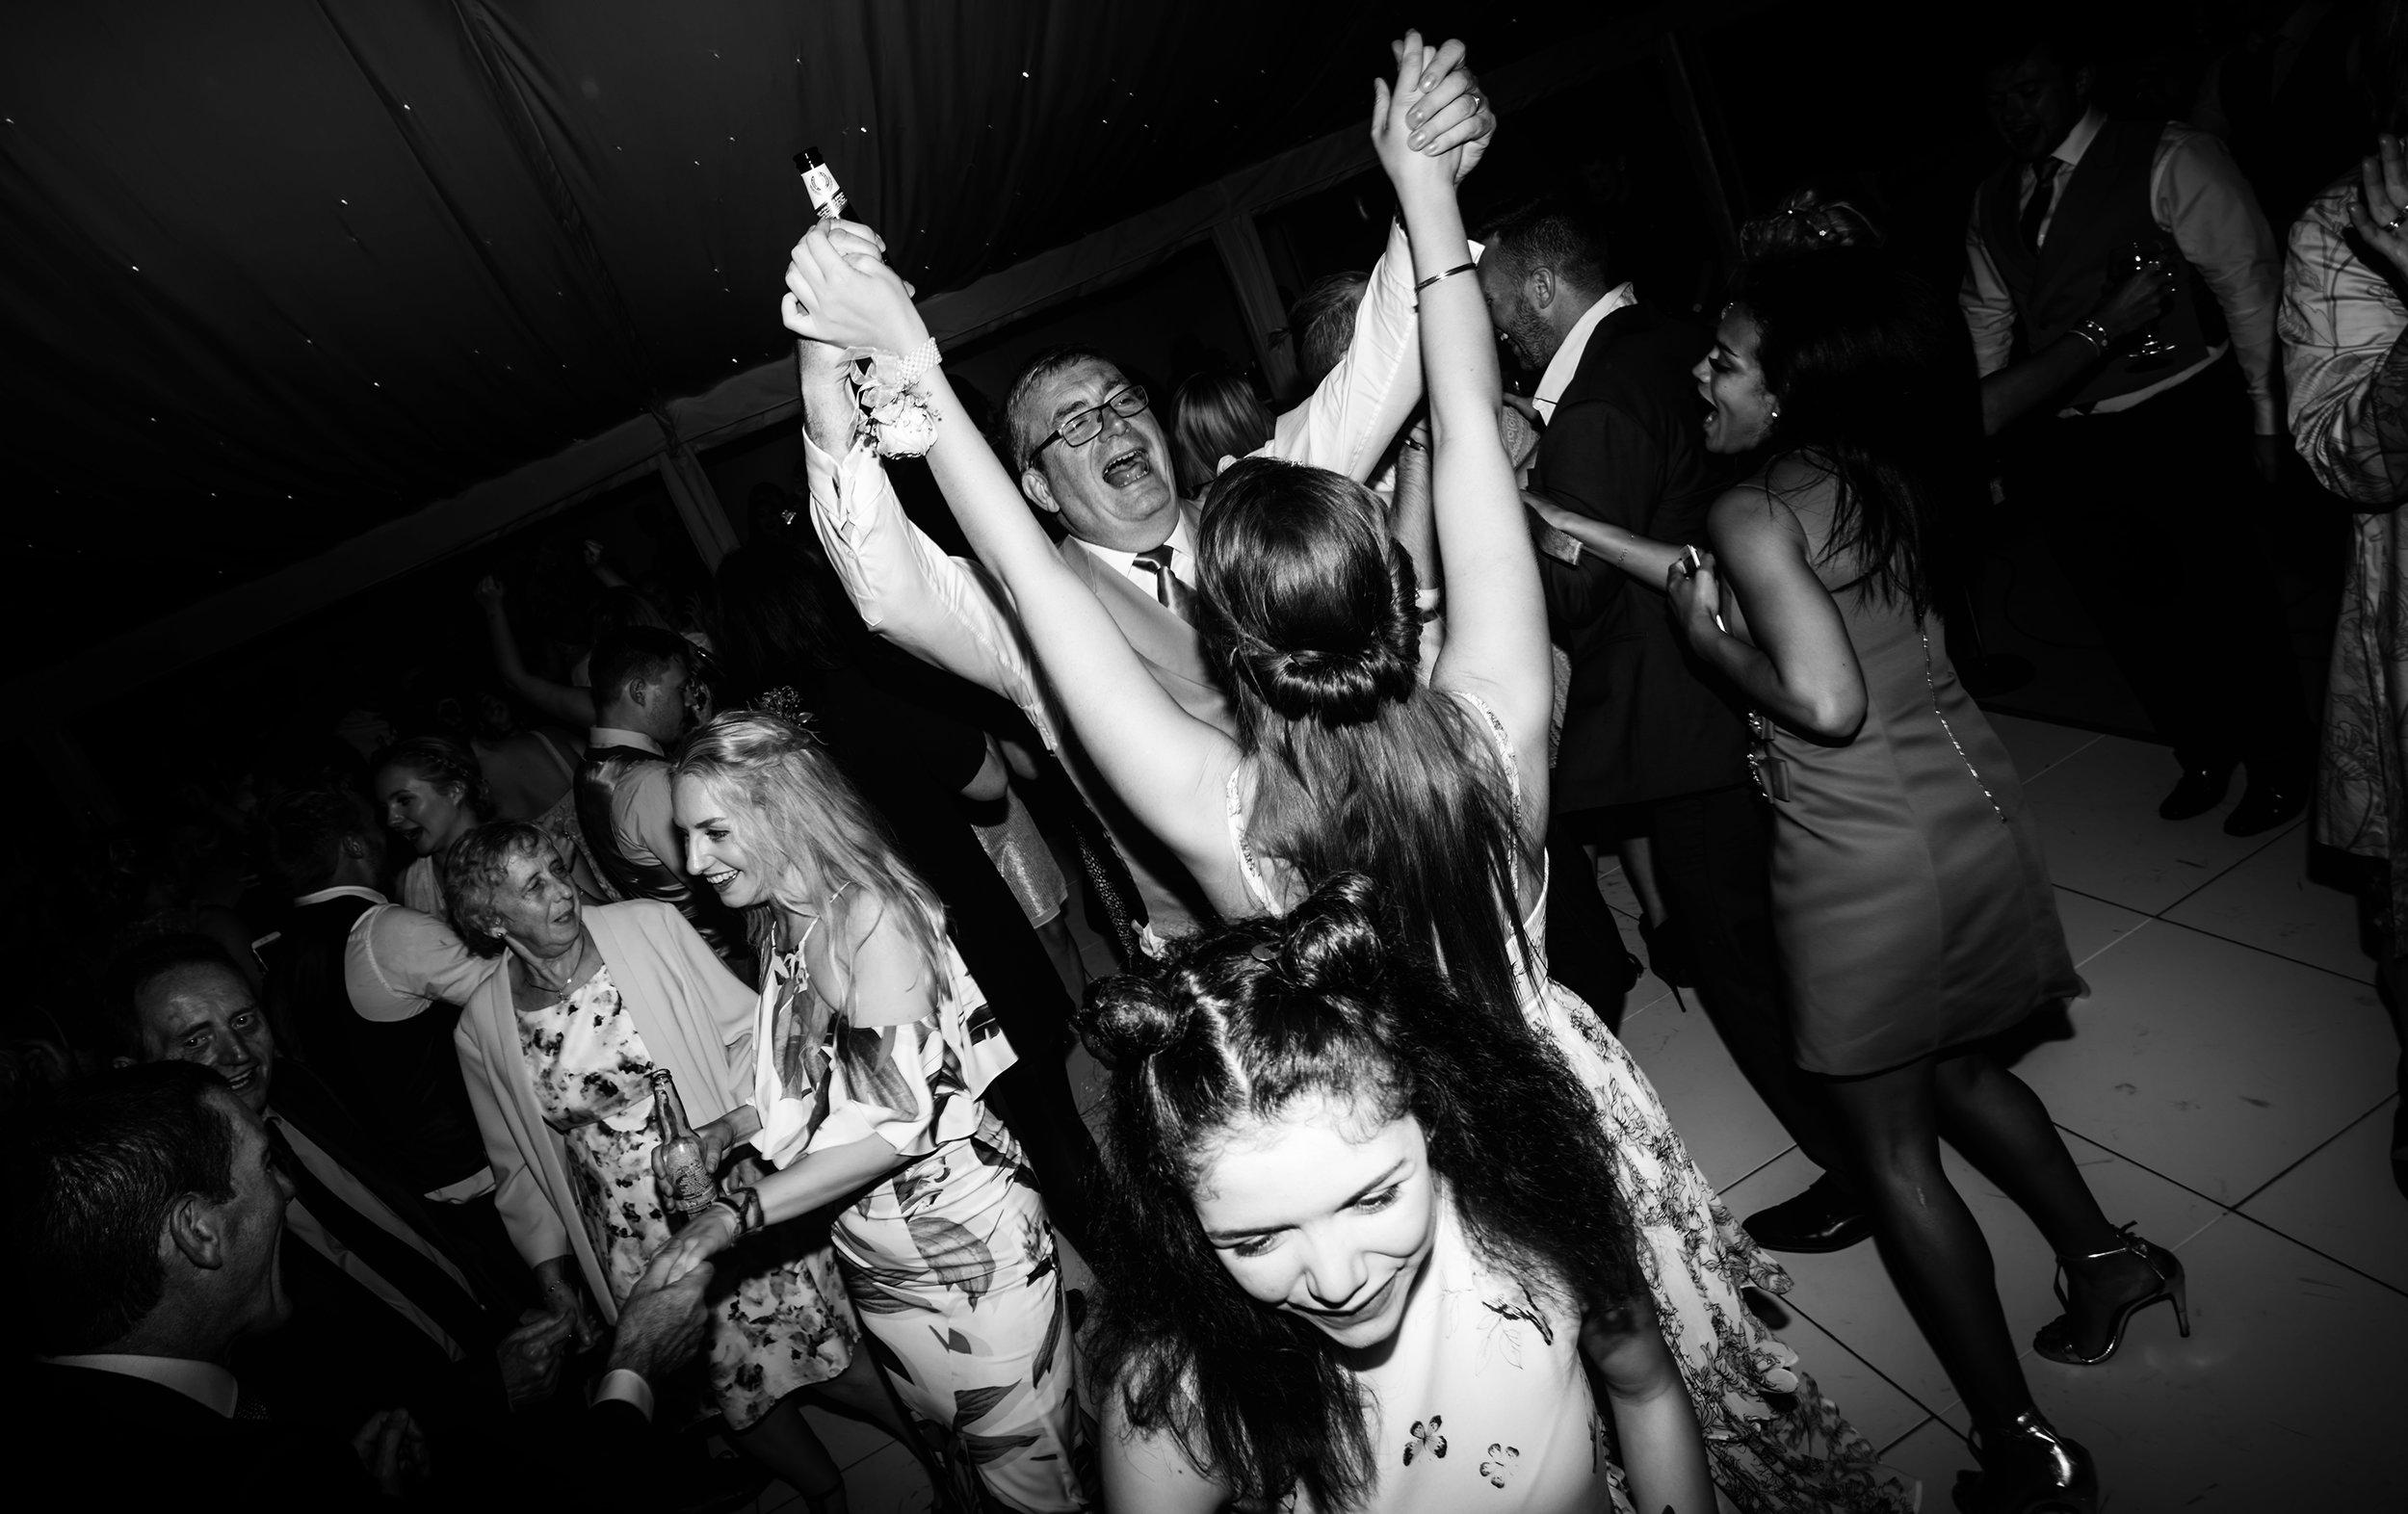 Dance floor madess